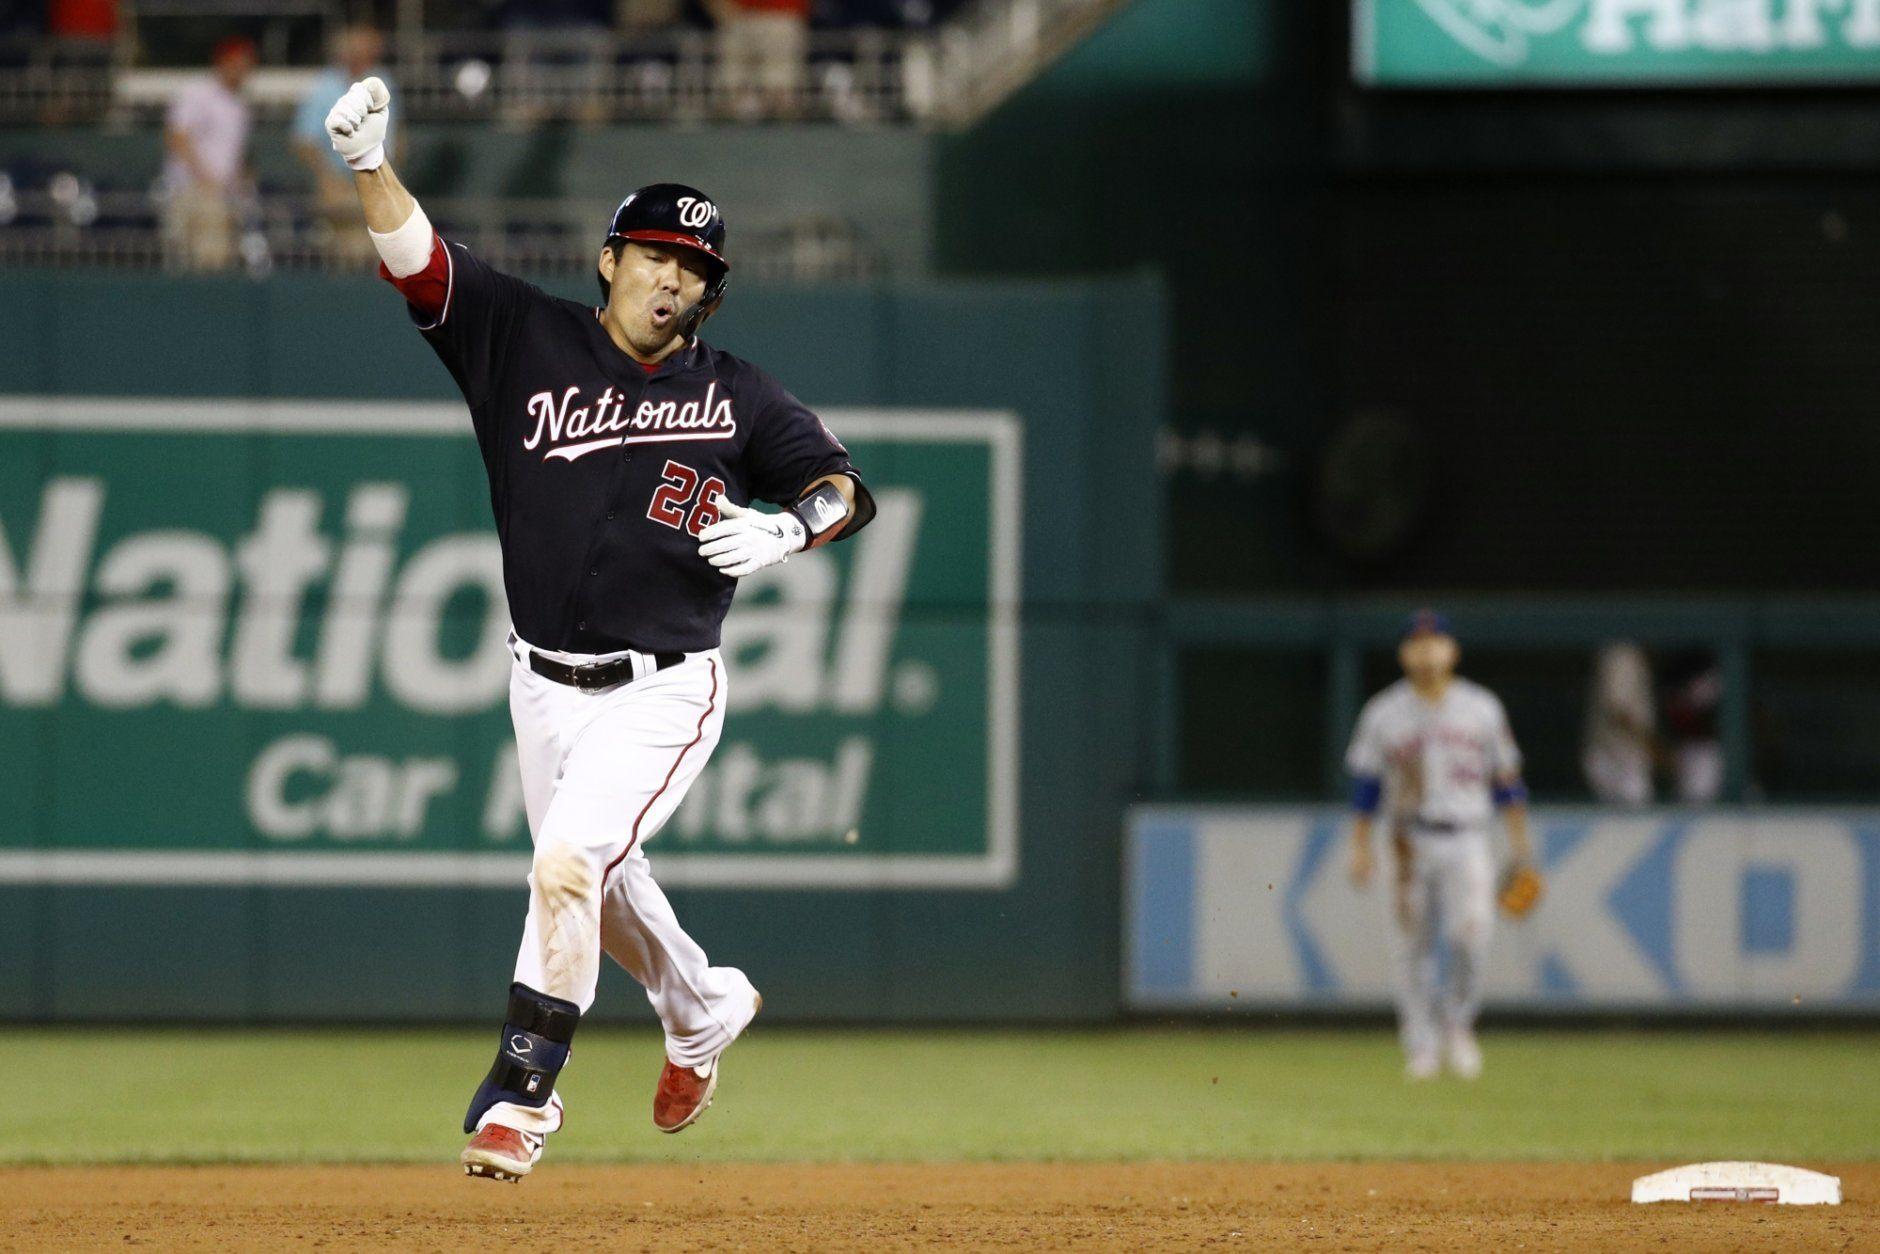 Suzuki HR caps Nats' best 9th-inning rally, beats Mets 11-10